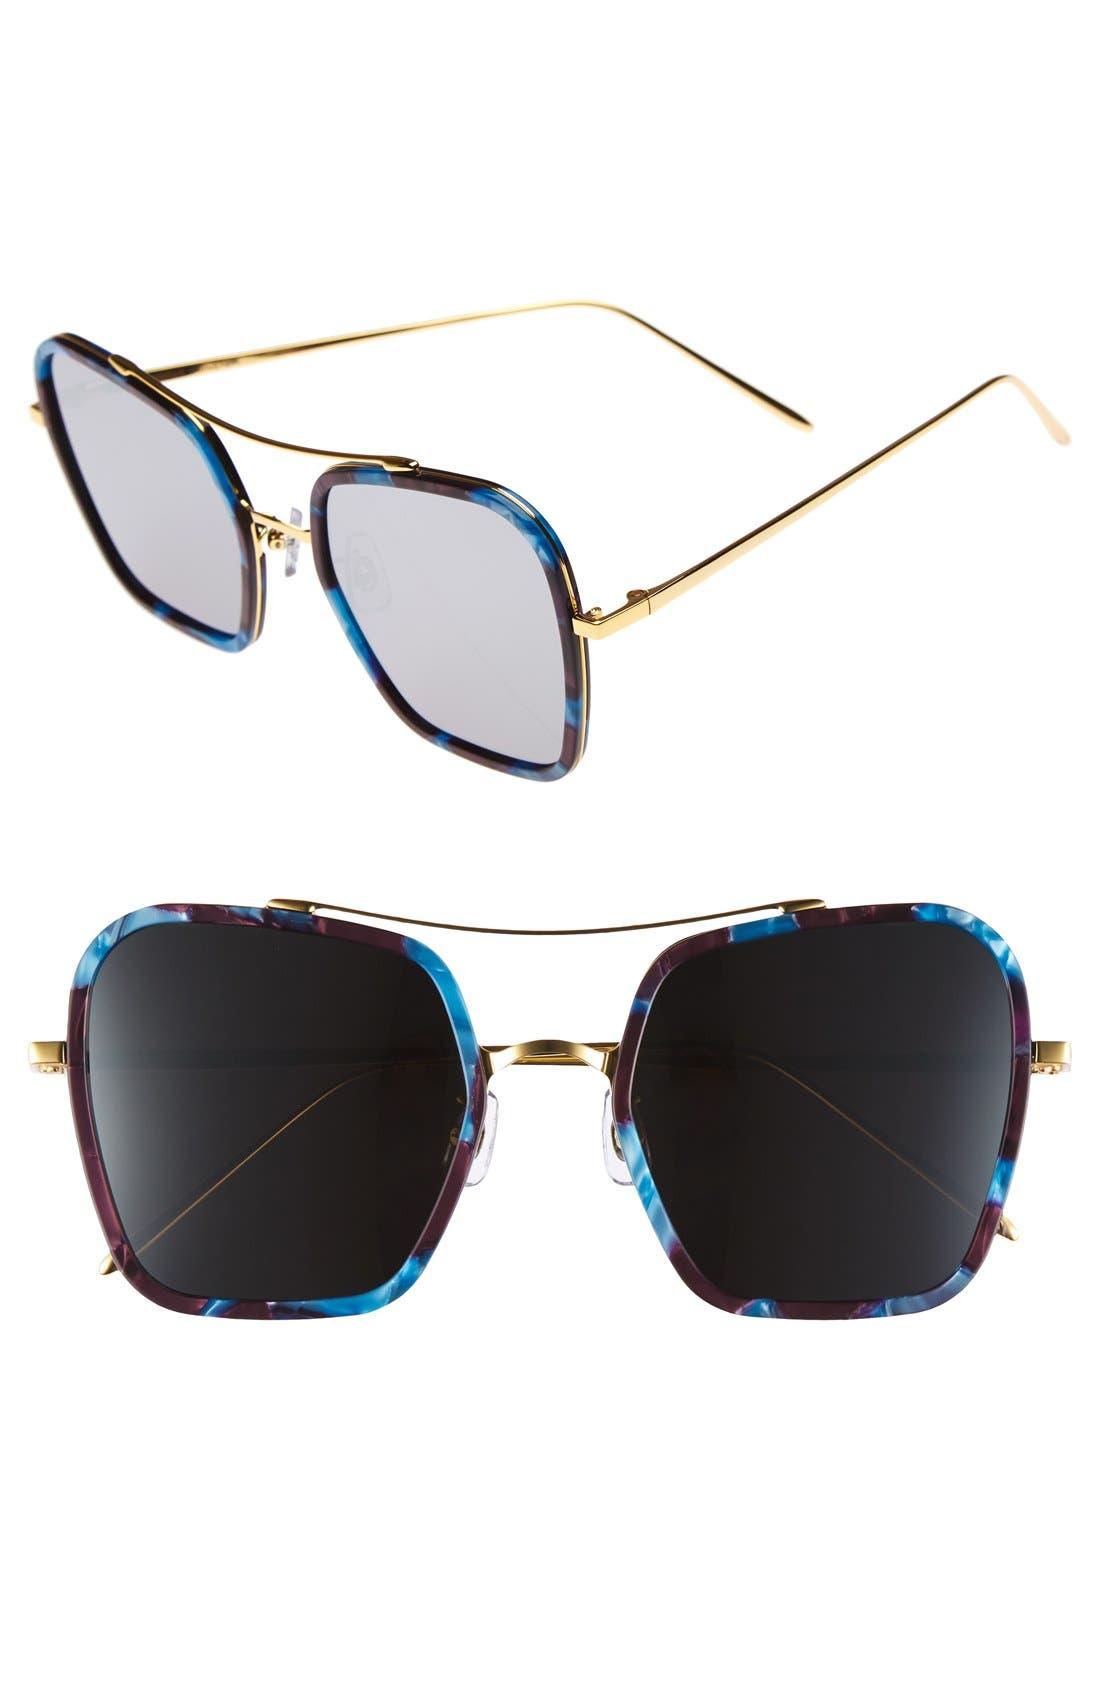 53mm Retro Square Sunglasses,                         Main,                         color, Blue/ Burgundy/ Black Mirror